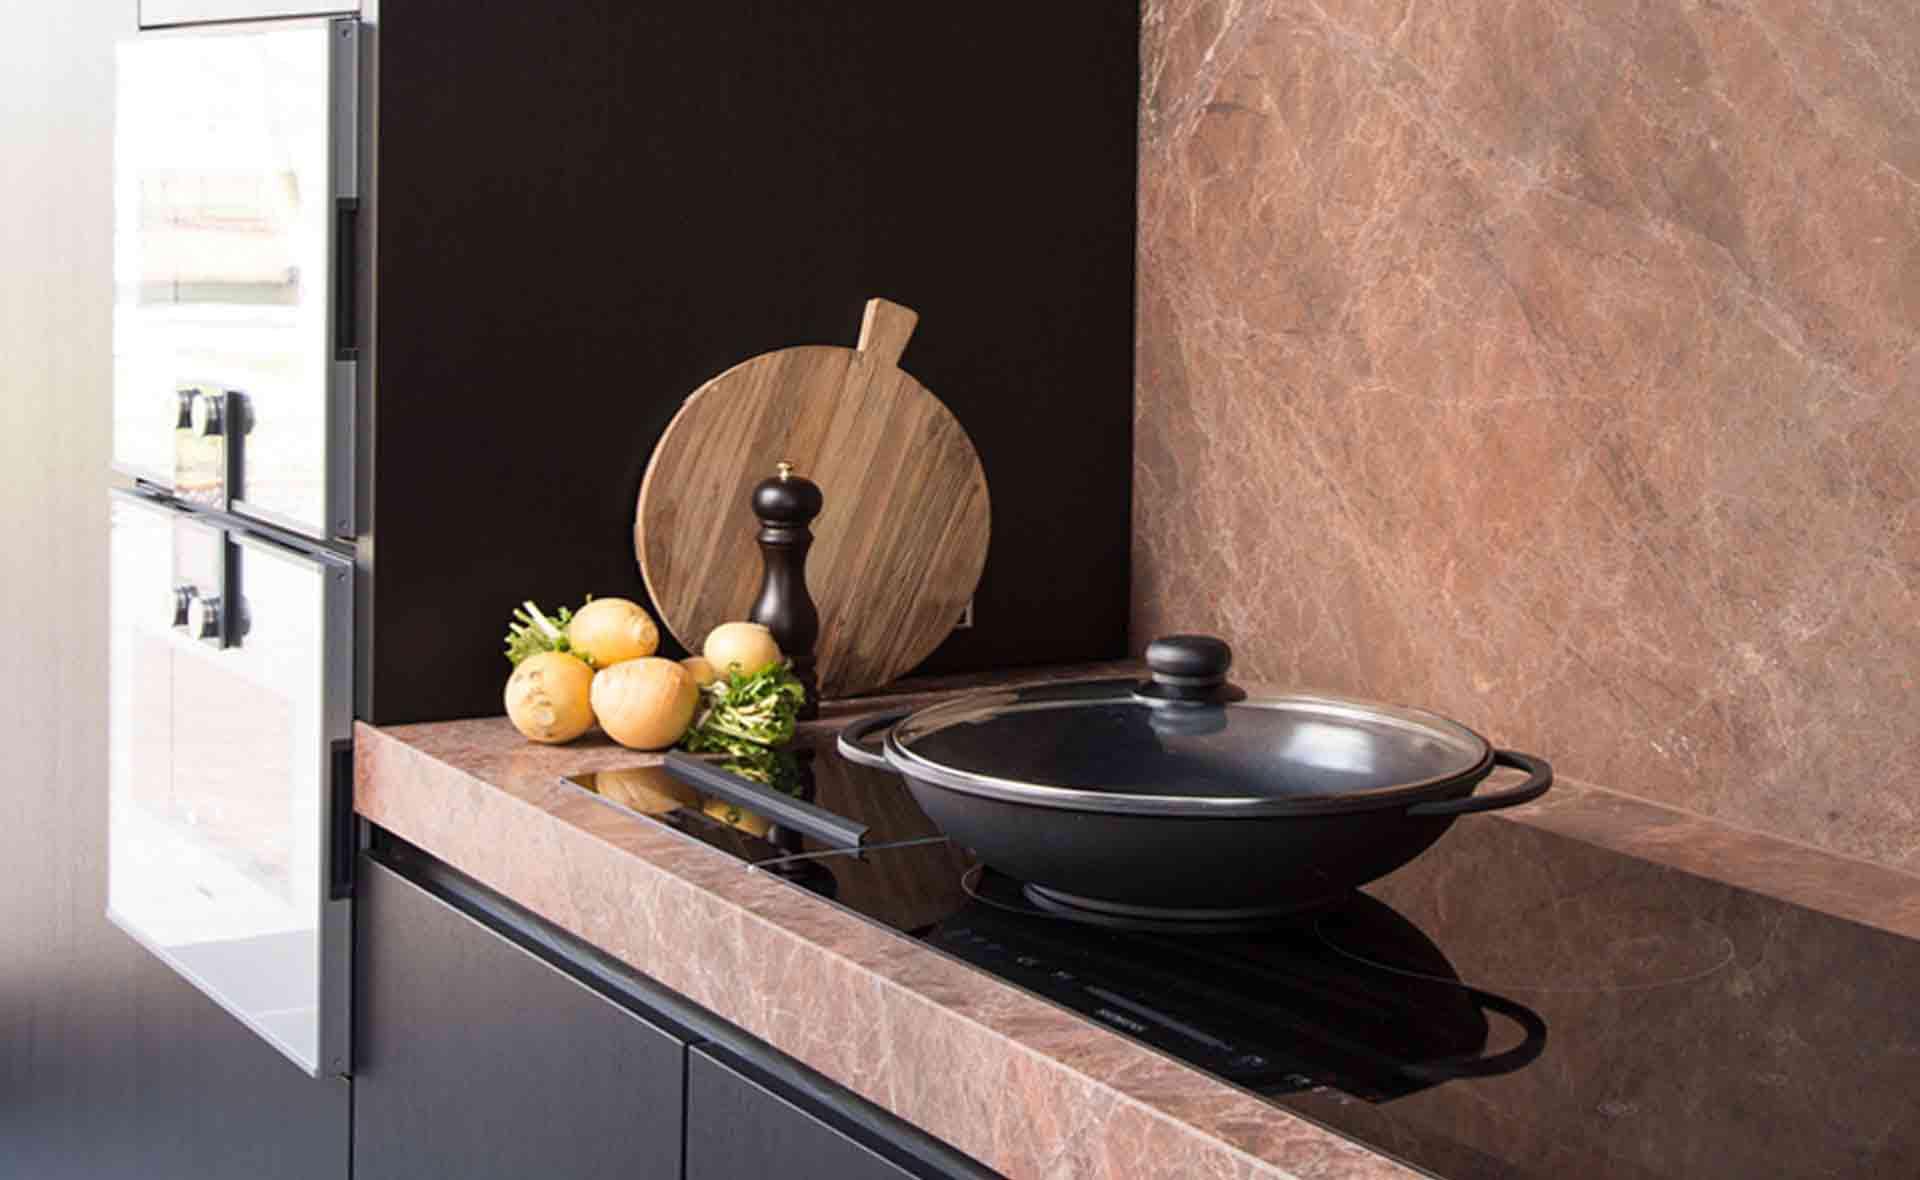 Dekeyzer-hedendaagse-keuken-bruine-tinten-2.jpg